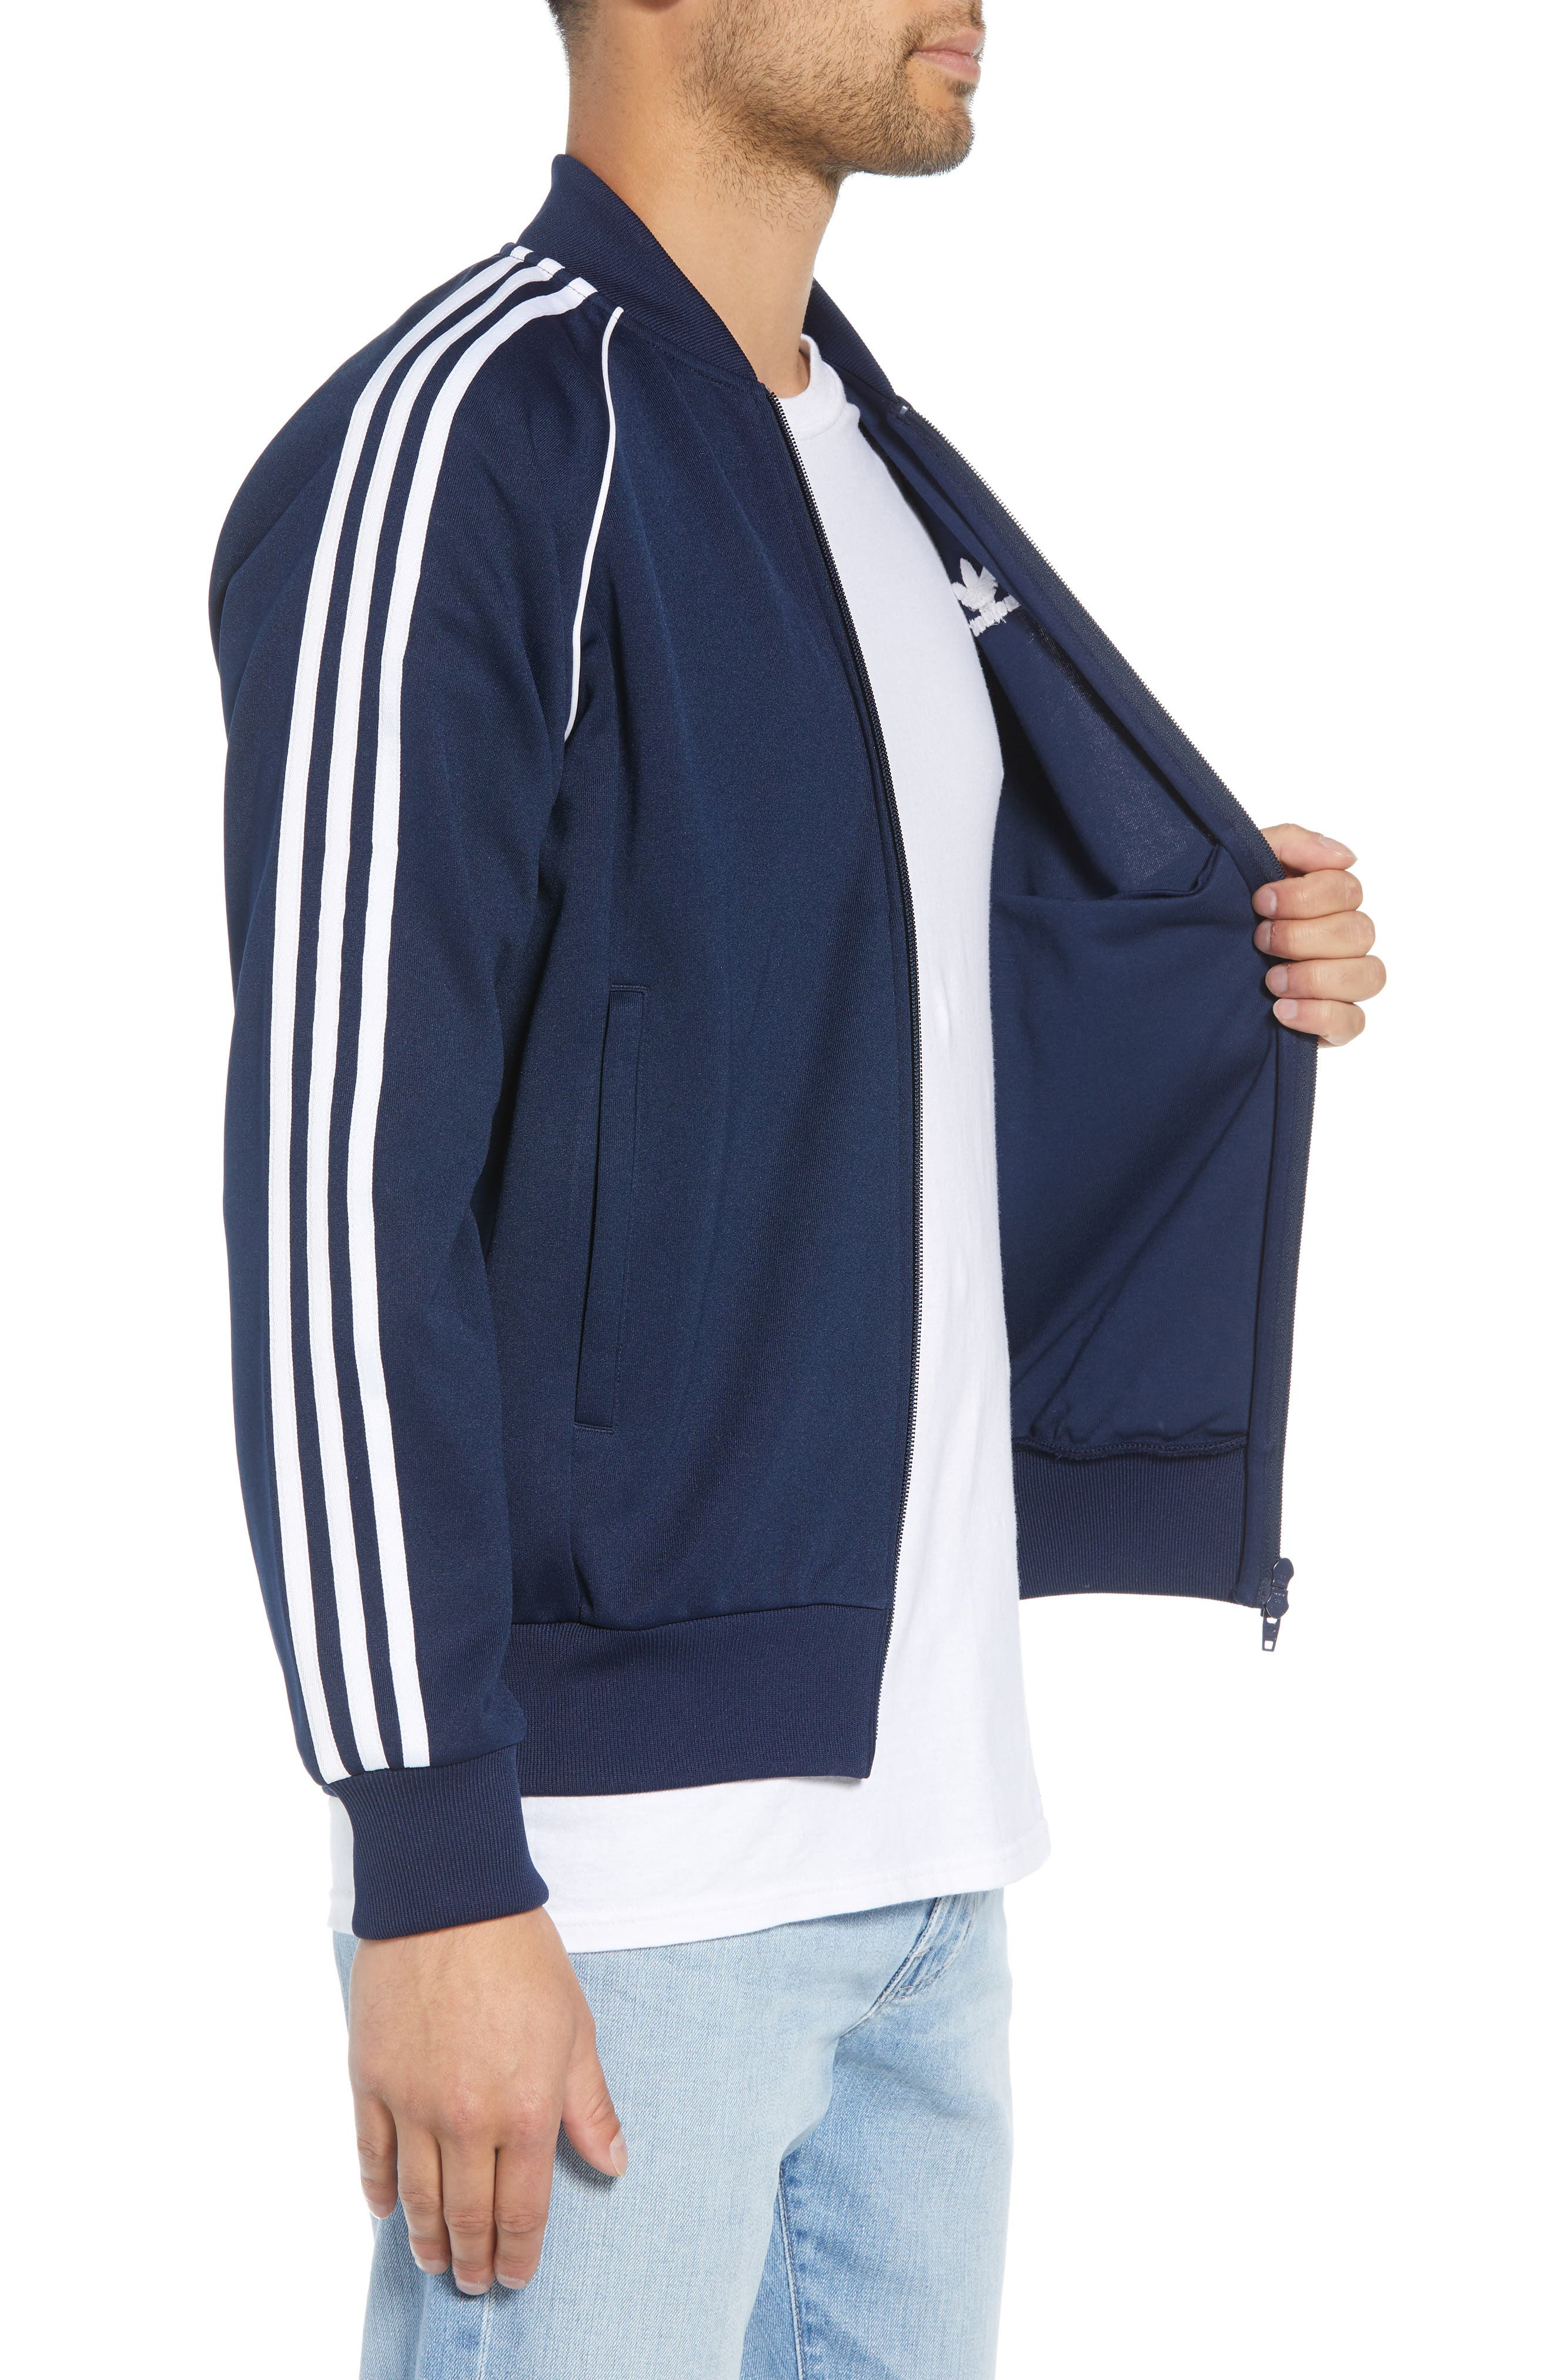 adidas SST Track Jacket,                             Alternate thumbnail 3, color,                             COLLEGIATE NAVY